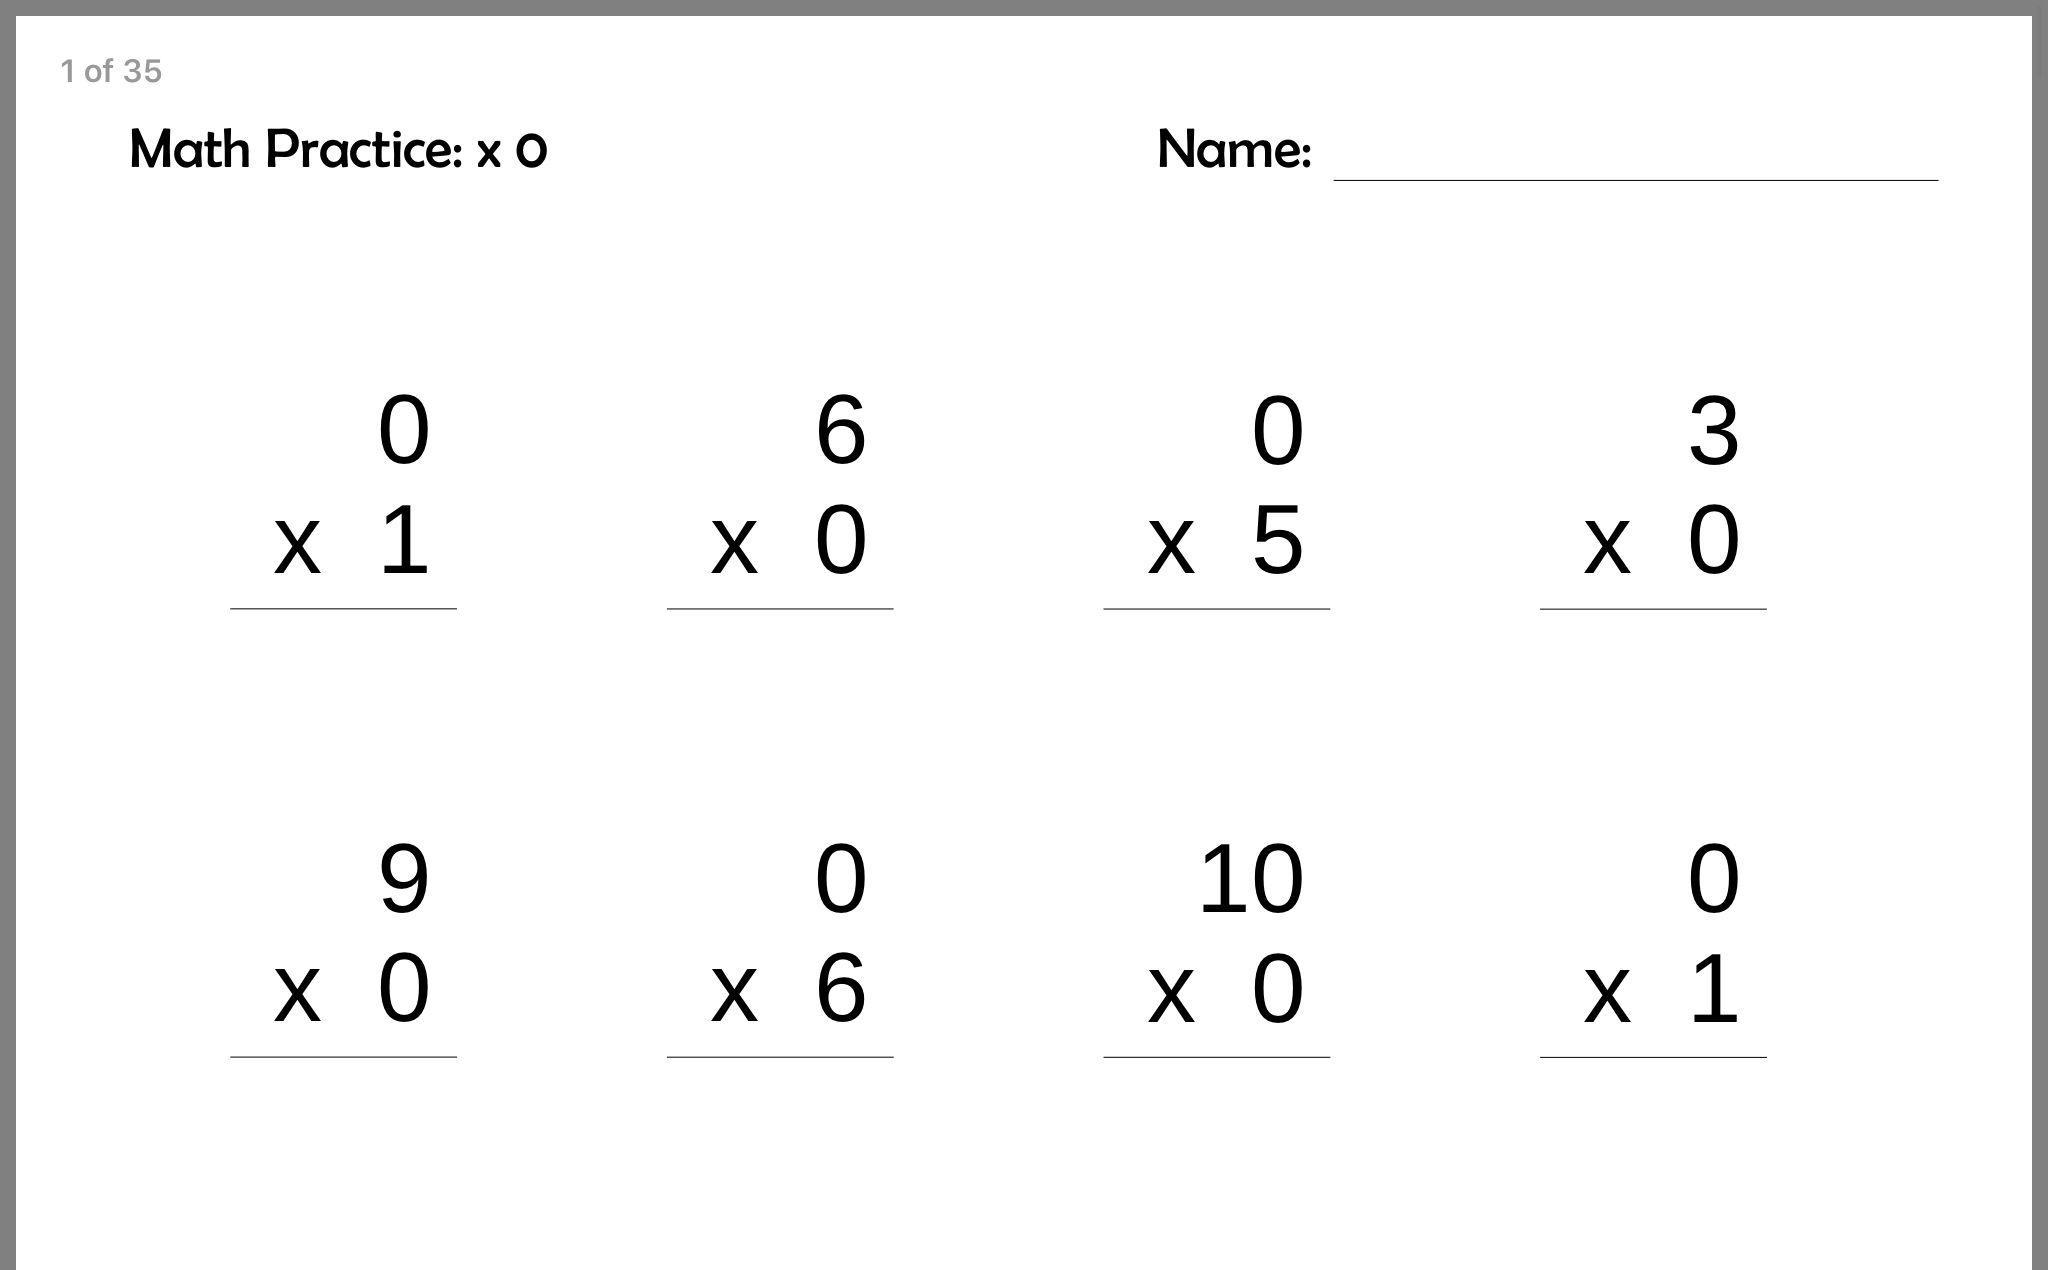 Math Practice Worksheet 3rd Grade